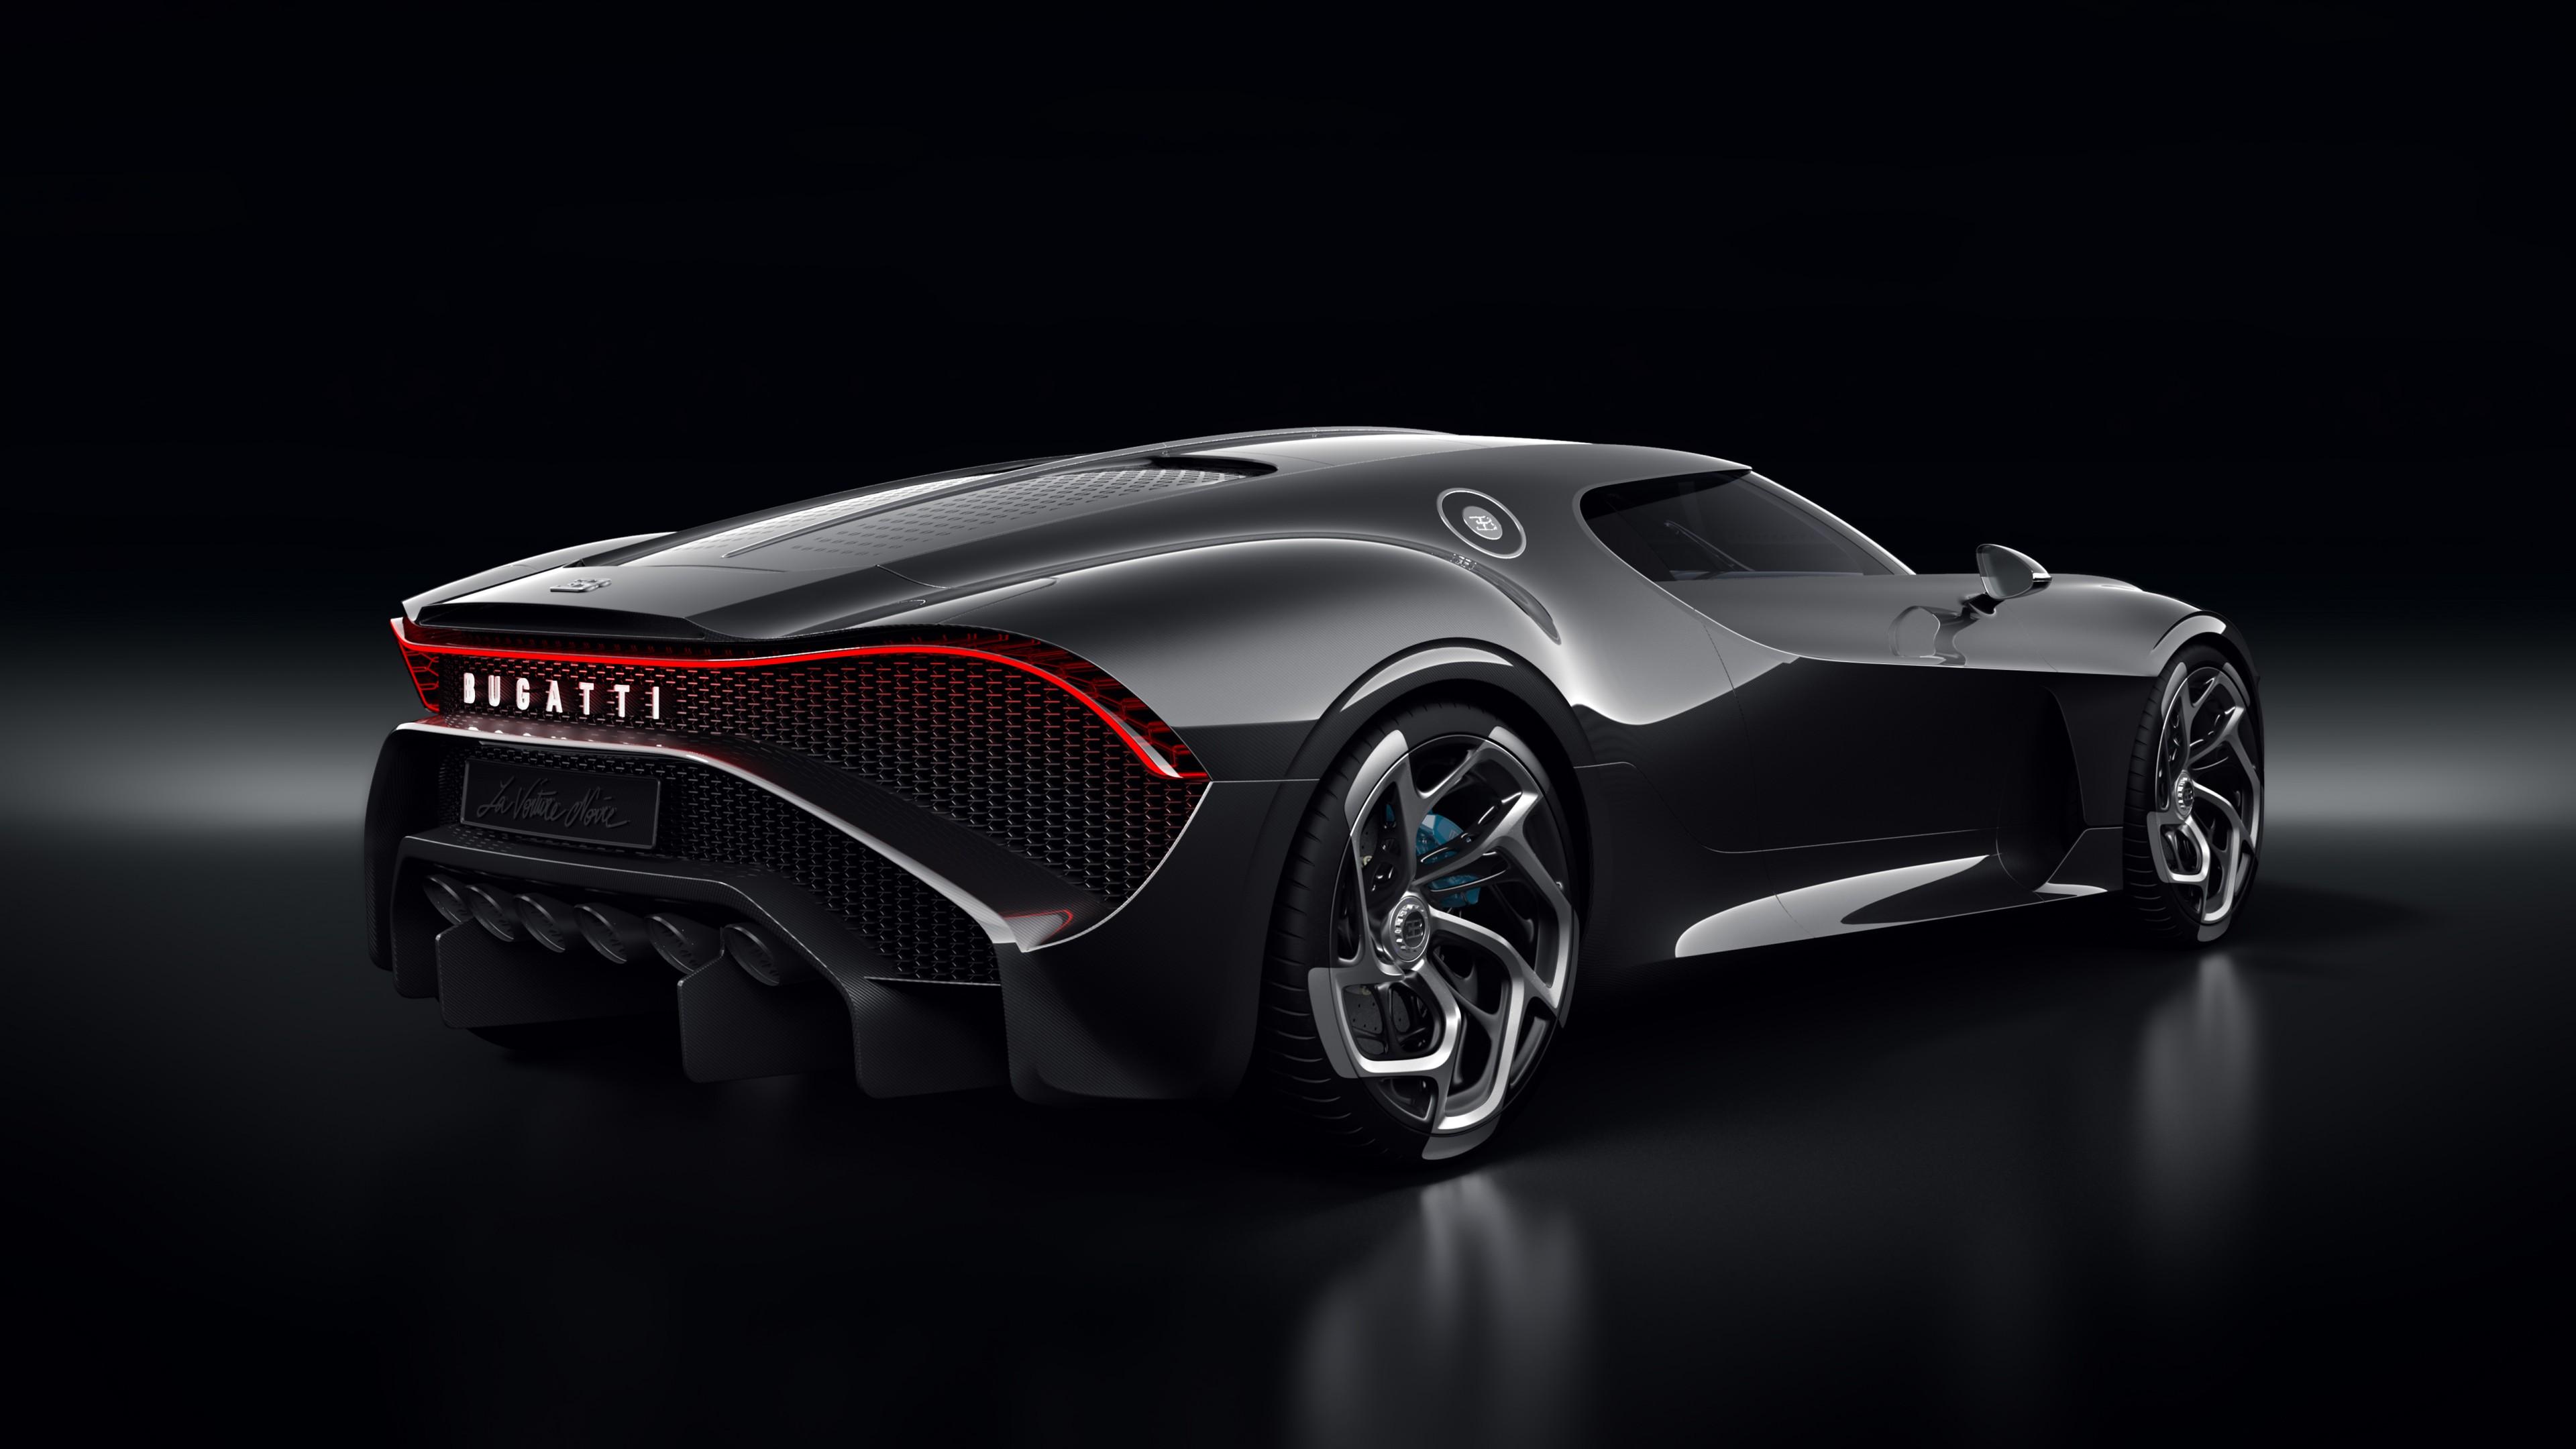 Bugatti La Voiture Noire 2019 4k 7 Wallpaper Hd Car